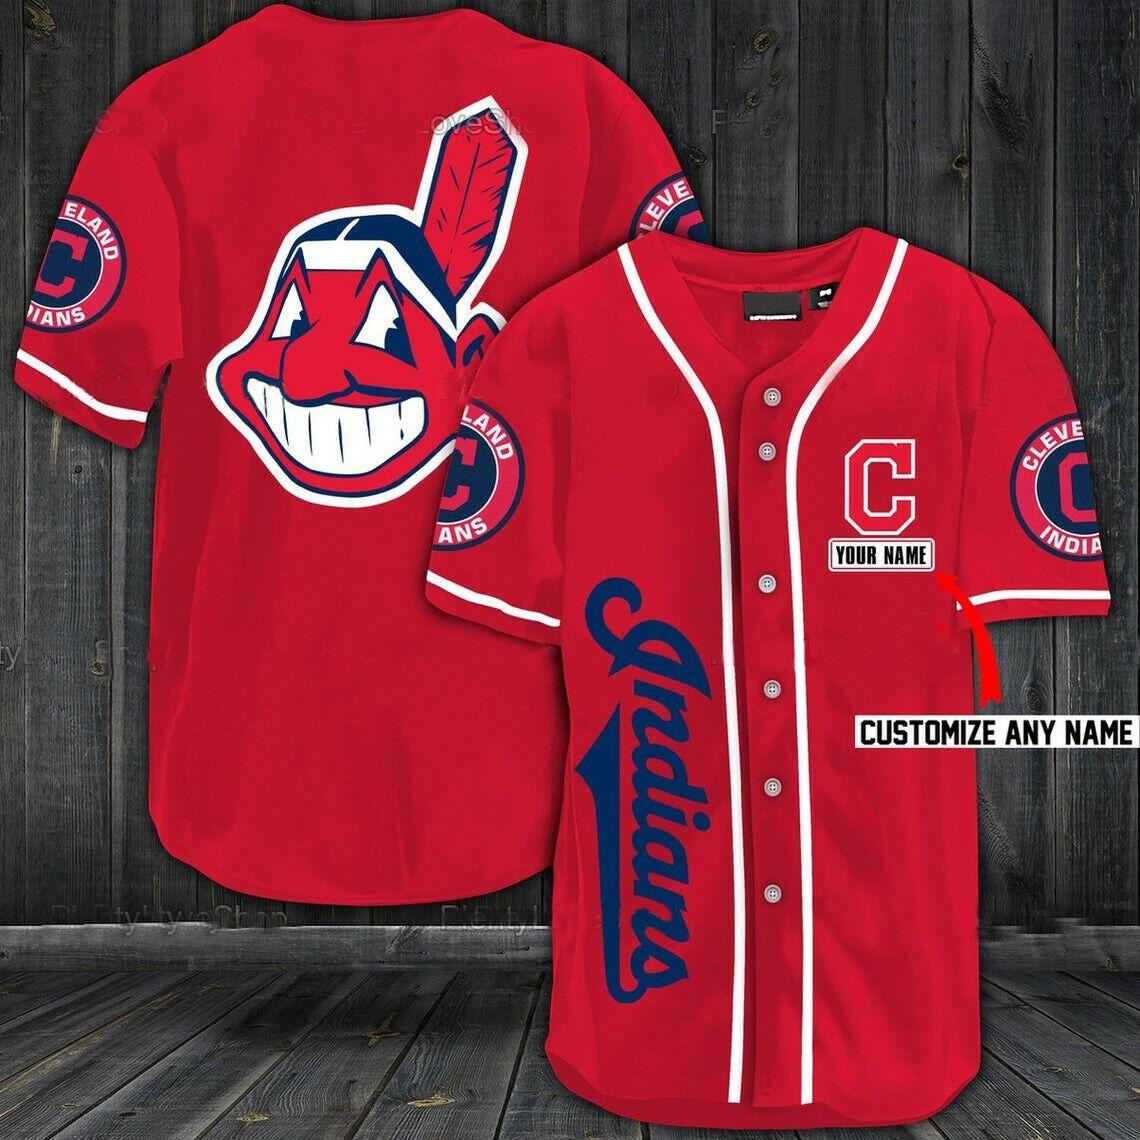 MLB Cleveland Indians custom name Baseball Jersey Shirt - LIMITED EDITION